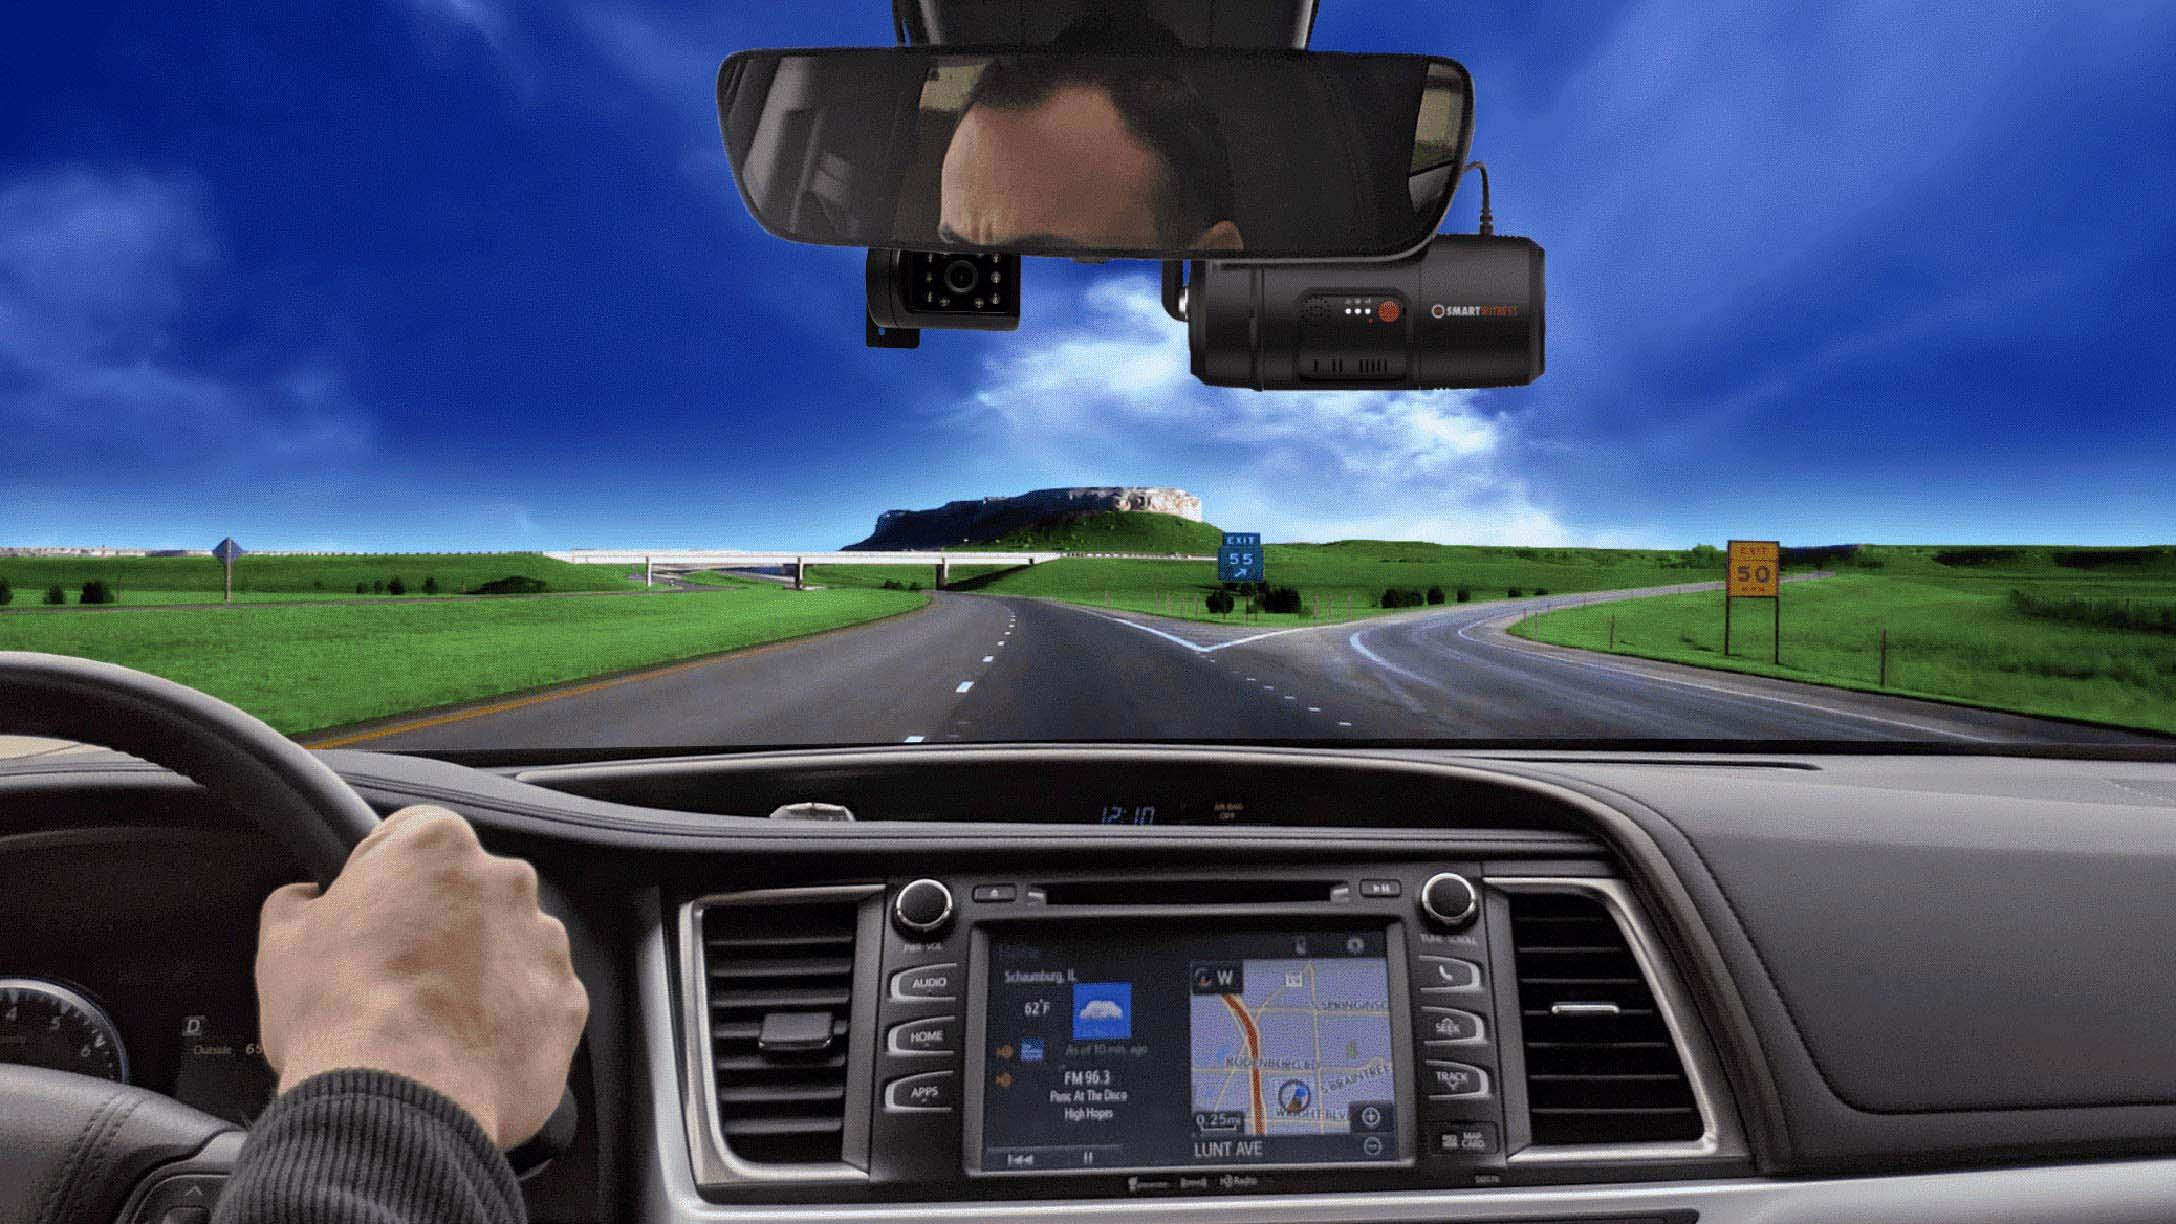 Driver POV driving down the road